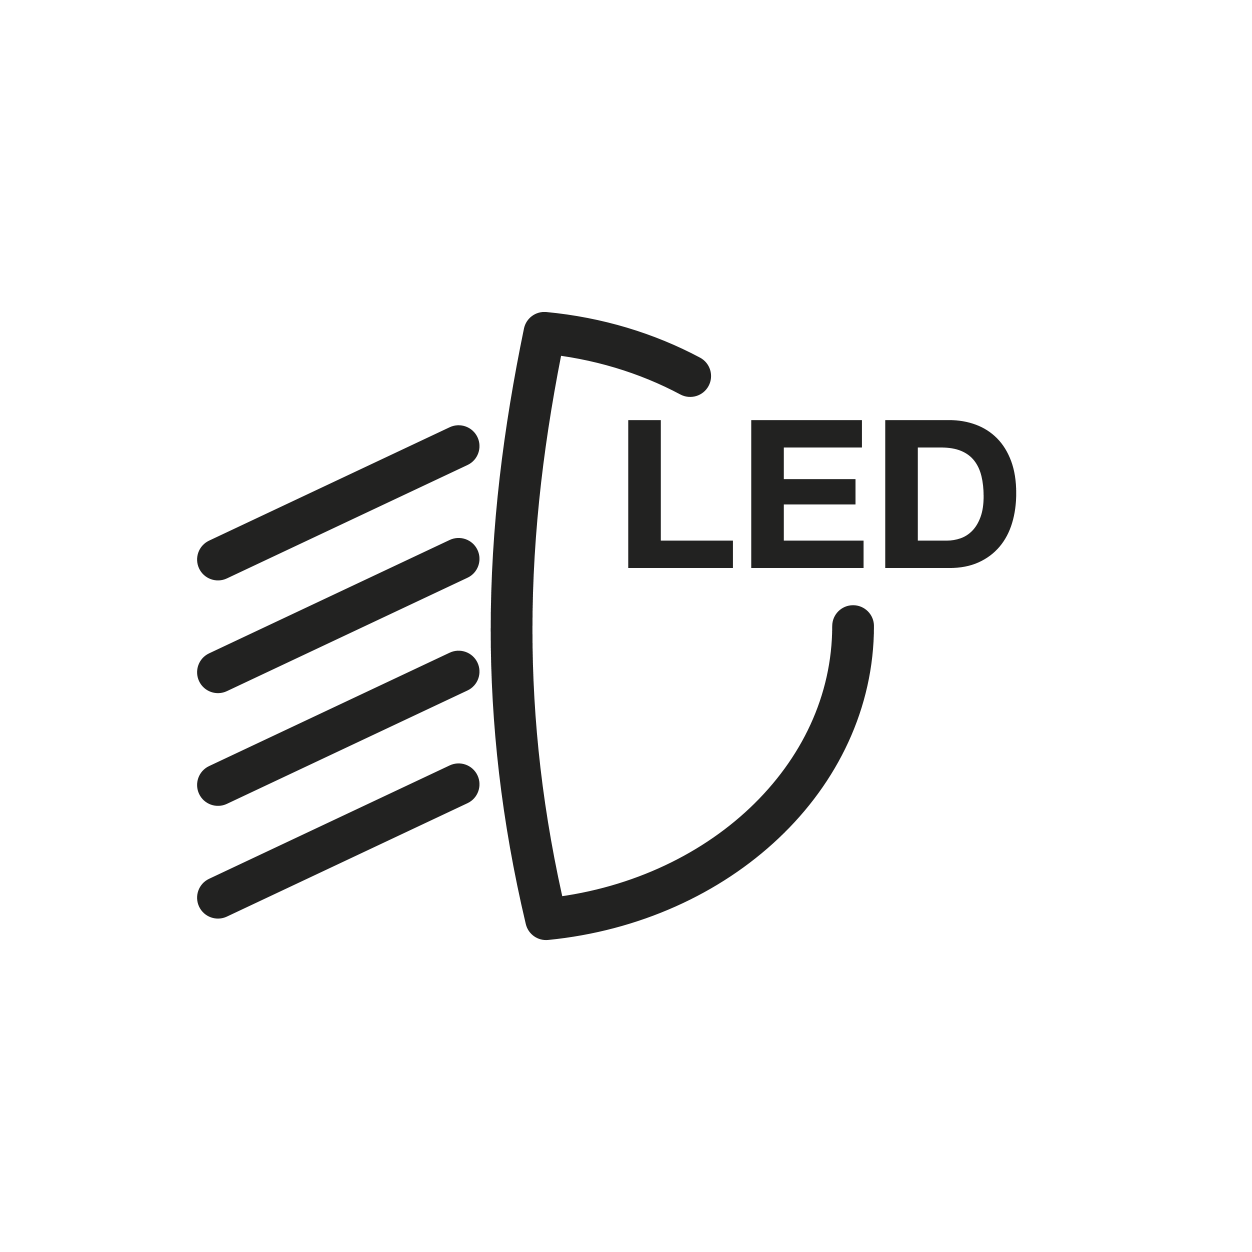 Full LED světlomety